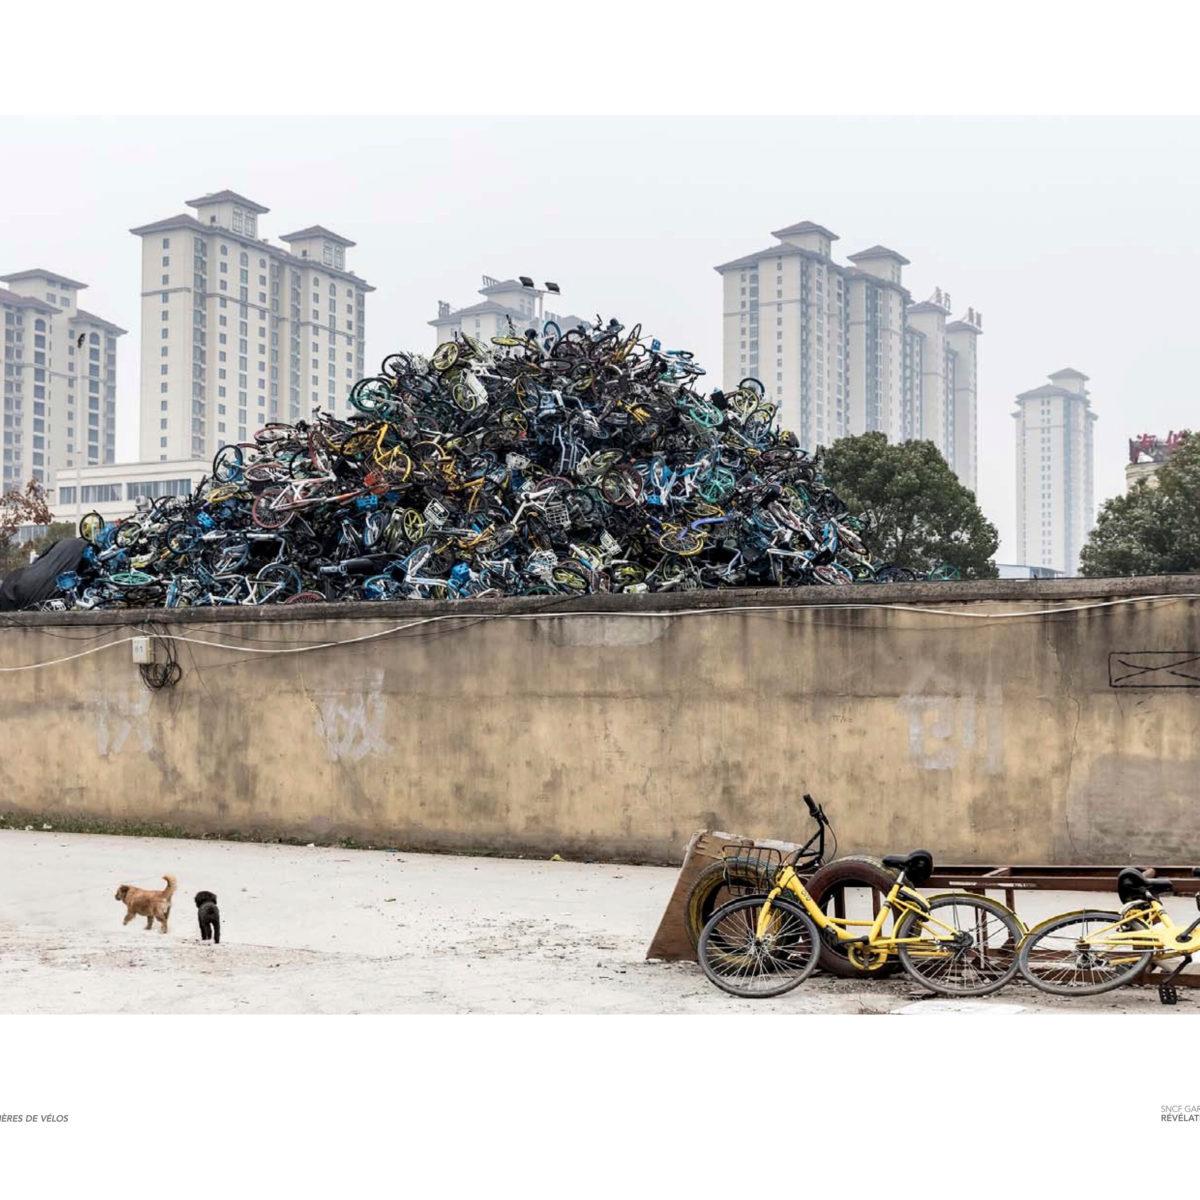 Wu Guoyong velo libre service dehcarge cimetiuere gaspillage